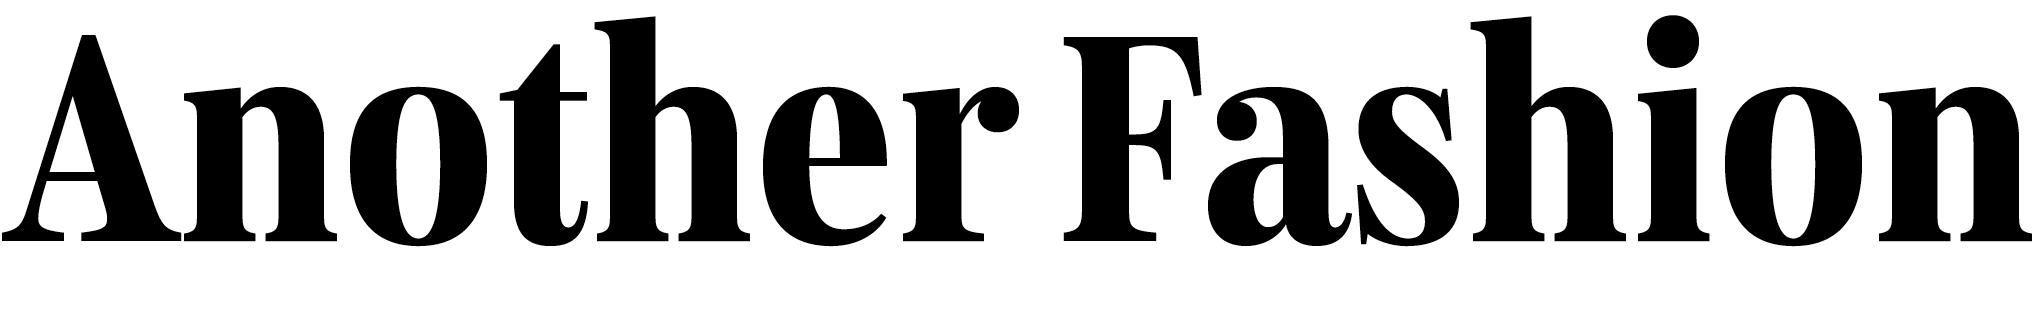 Süddeutsche Zeitung  a complex typeface system with 46 fonts